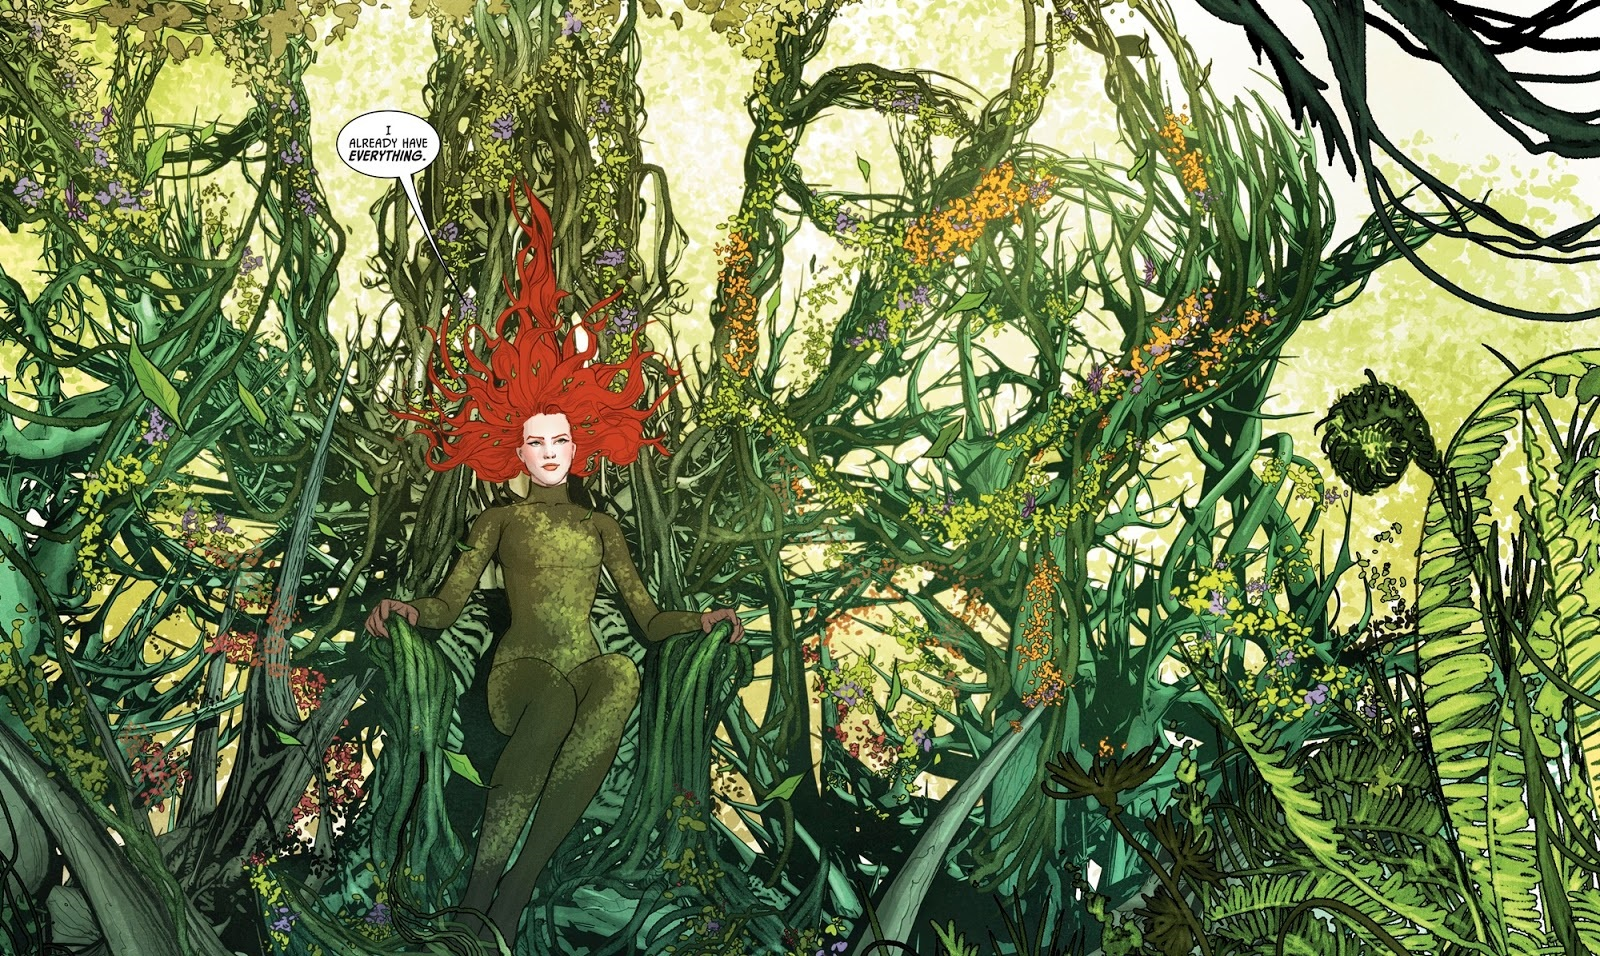 Batman Poison Ivy throne of green